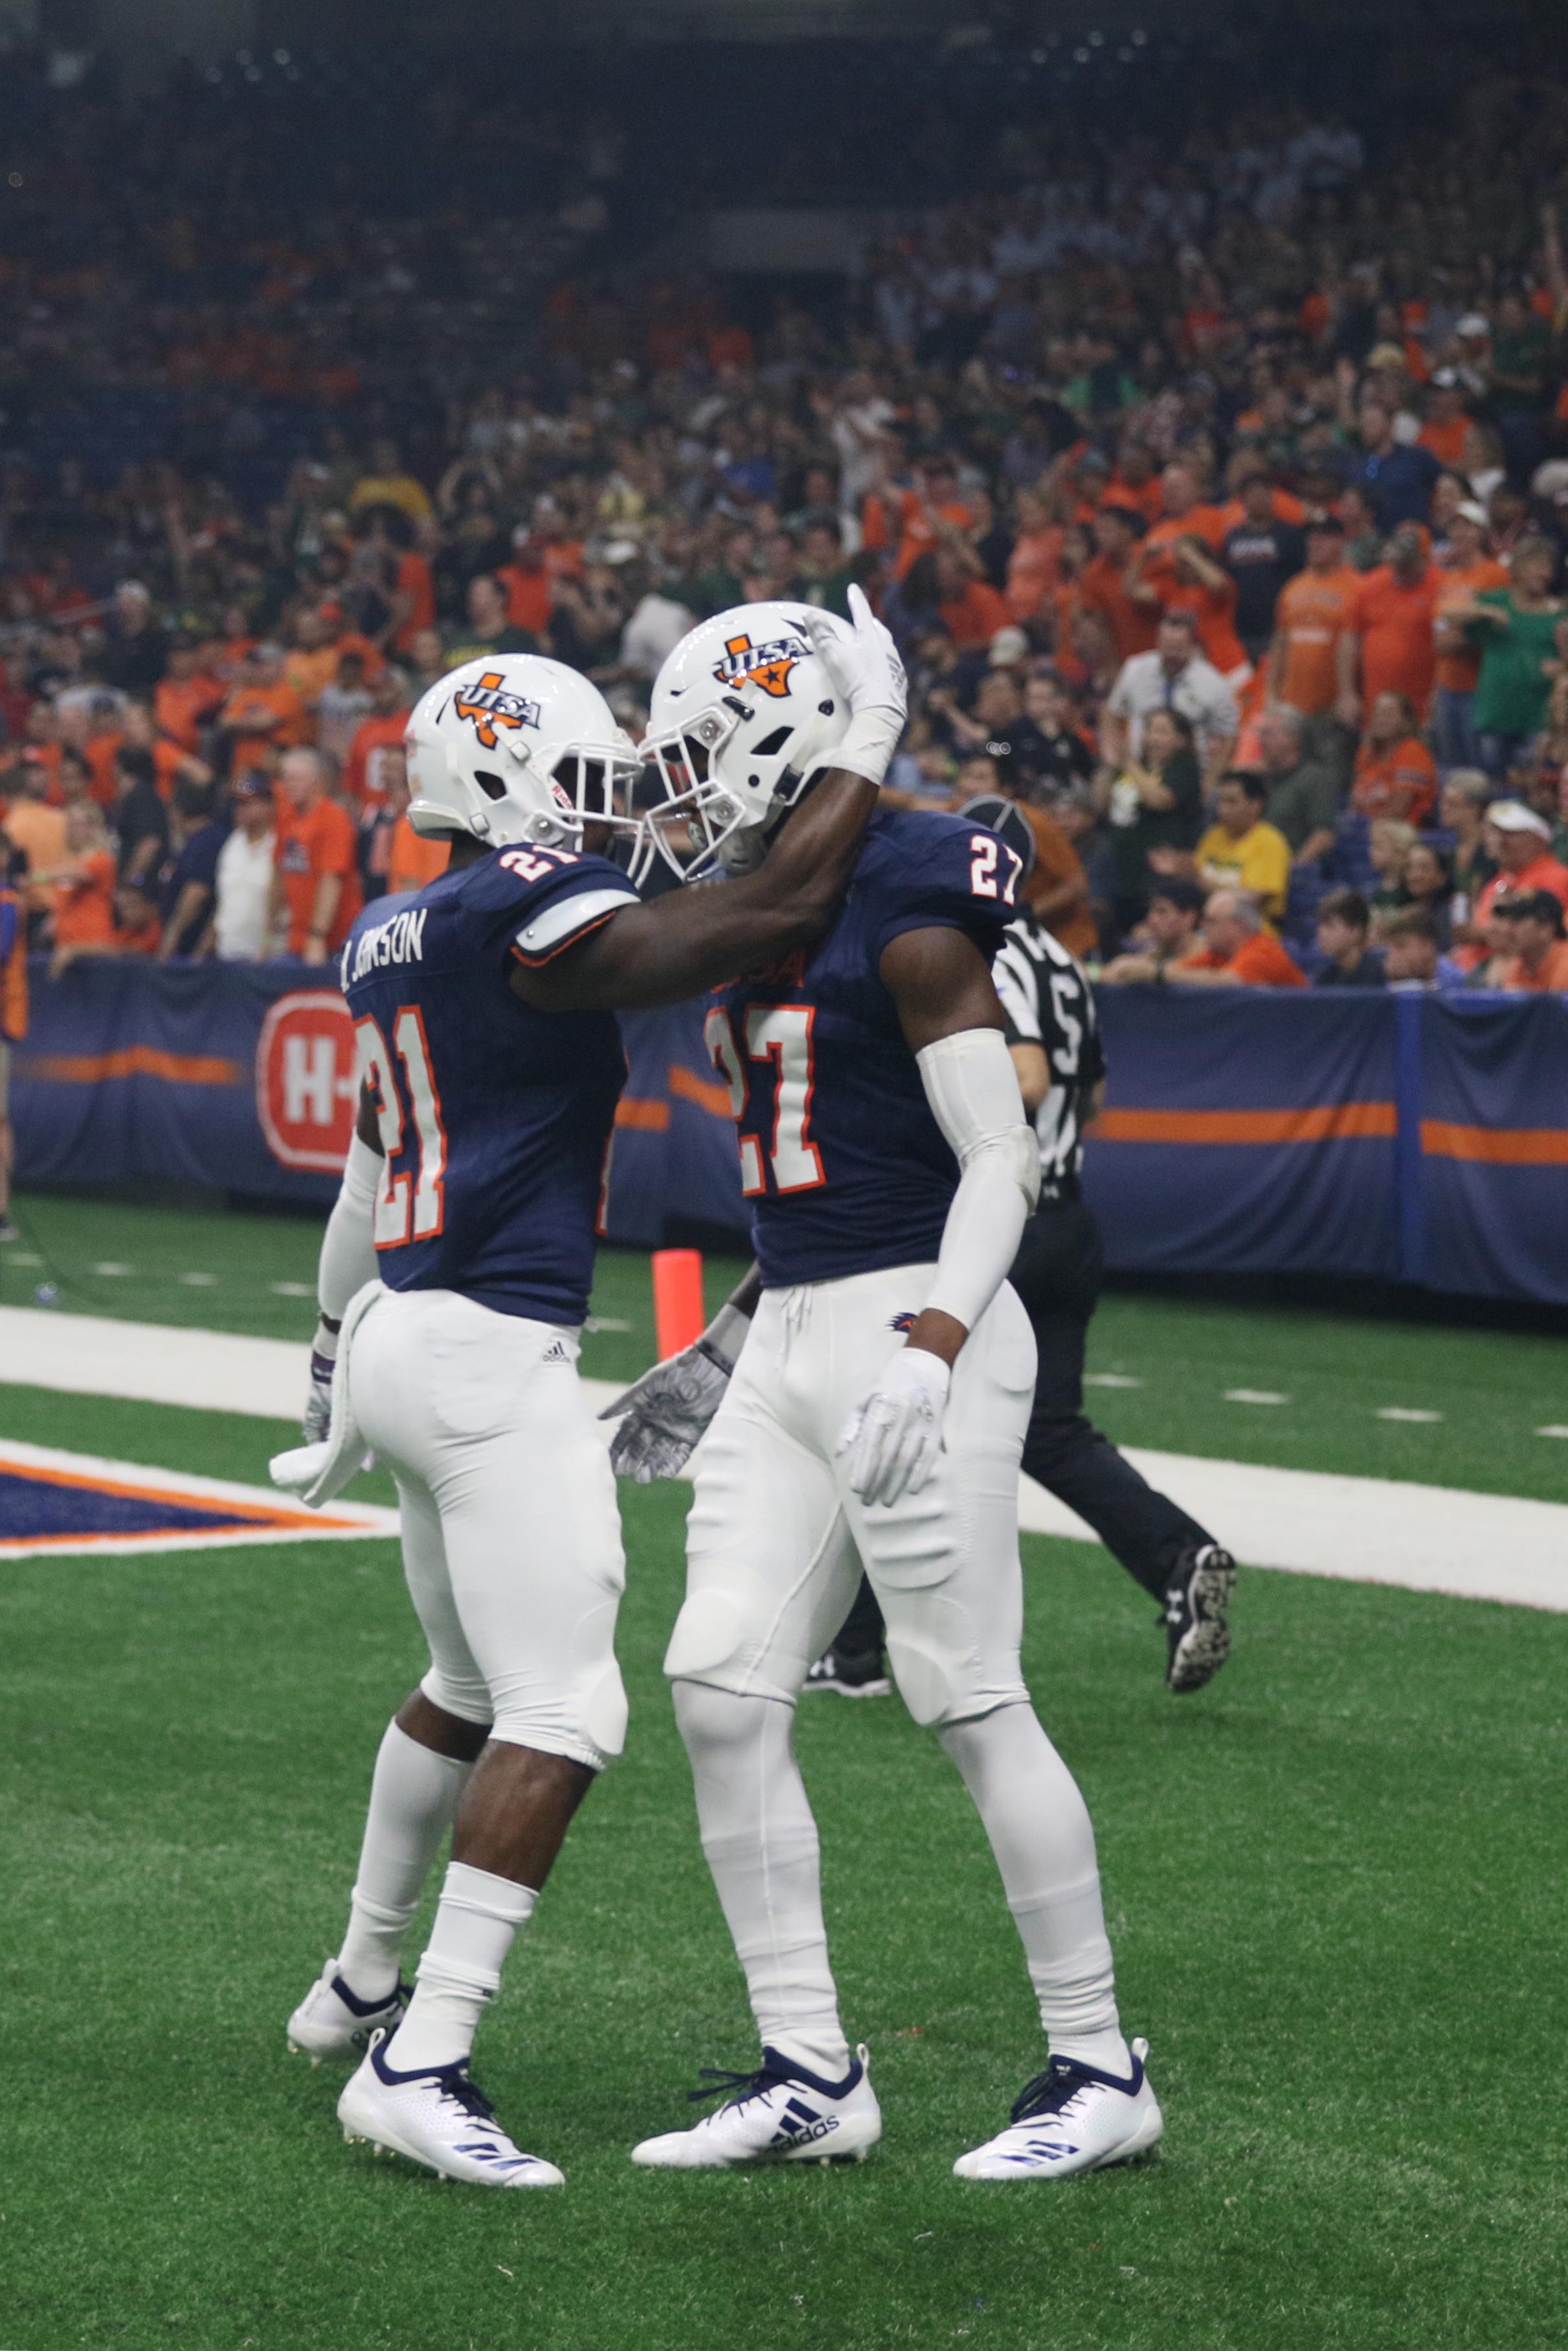 Brenndan Johnson and Teddrick McGhee celebrate a touchdown. Photo by Lindsey Thomas